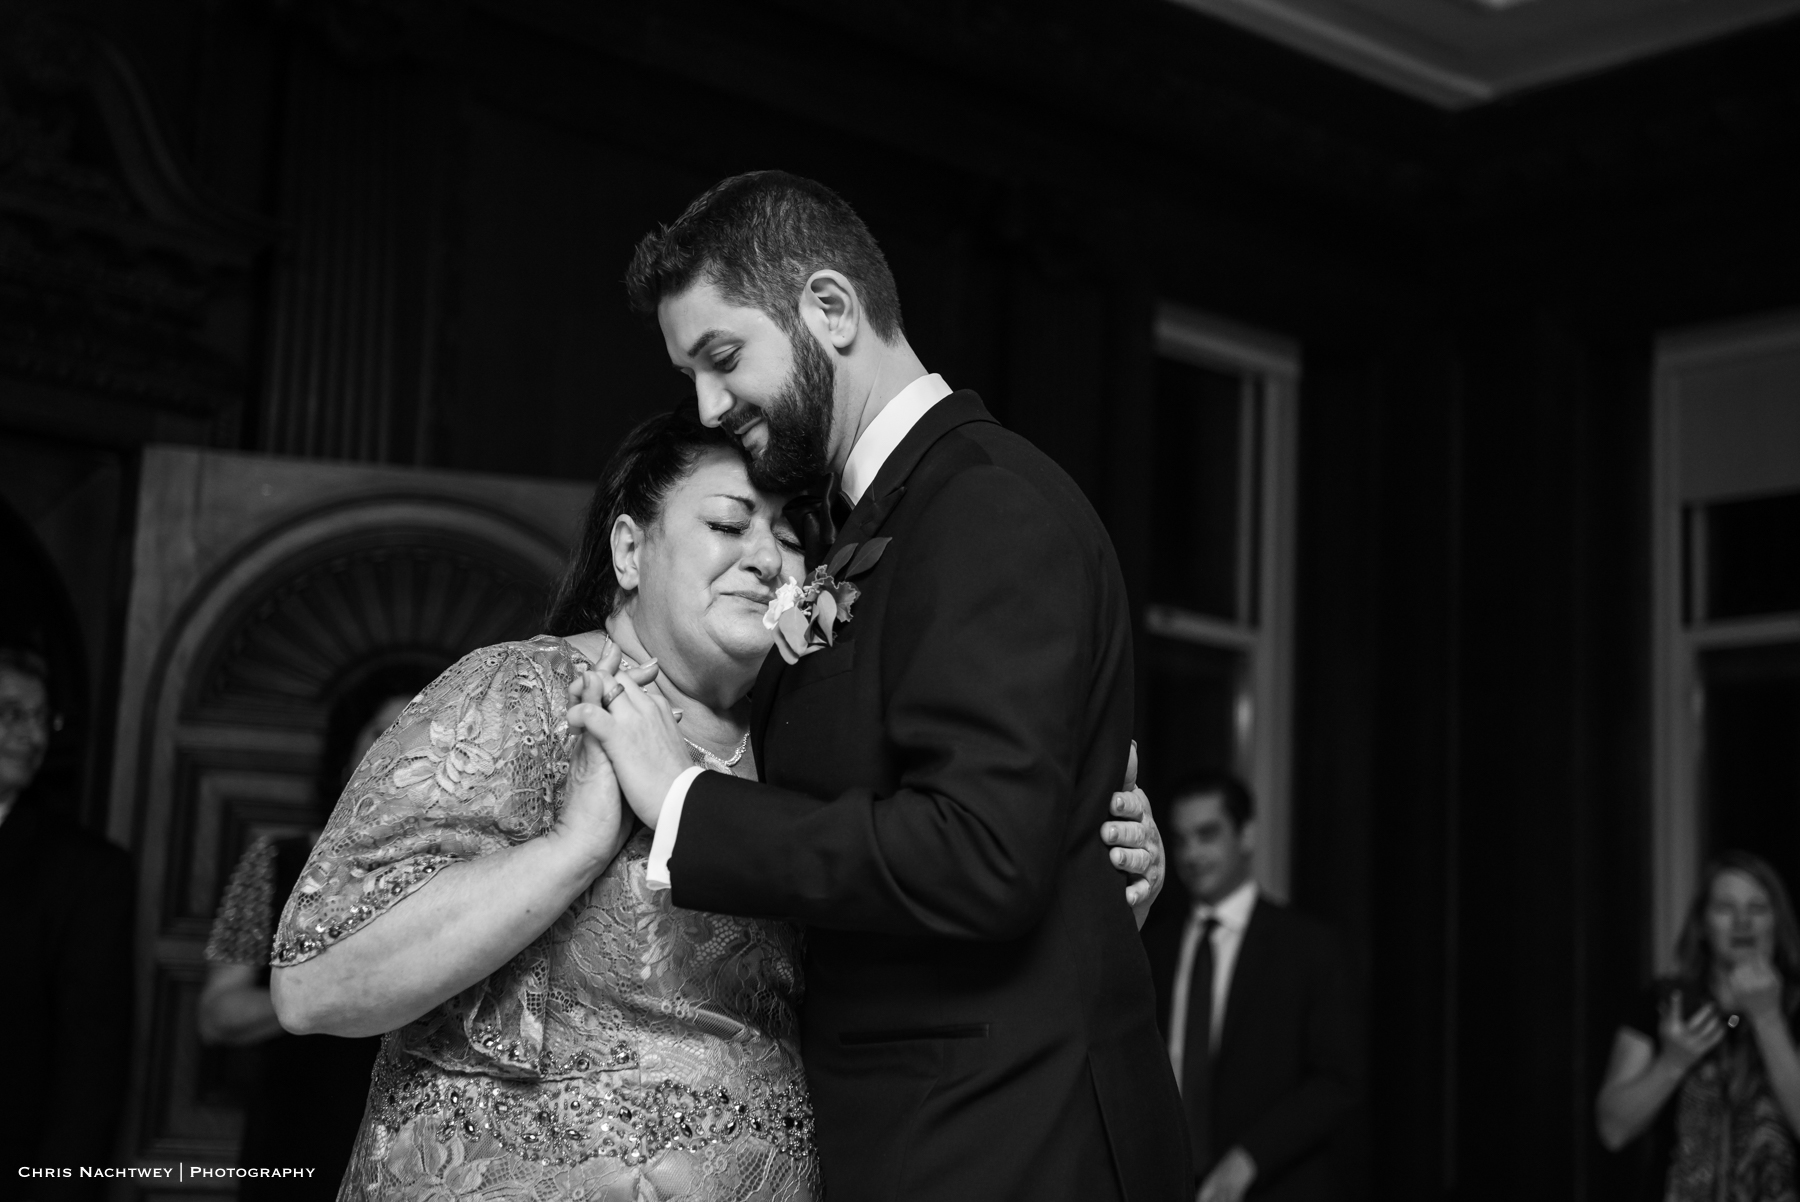 winter-branford-house-wedding-photos-groton-ct-chris-nachtwey-photography-2019-44.jpg